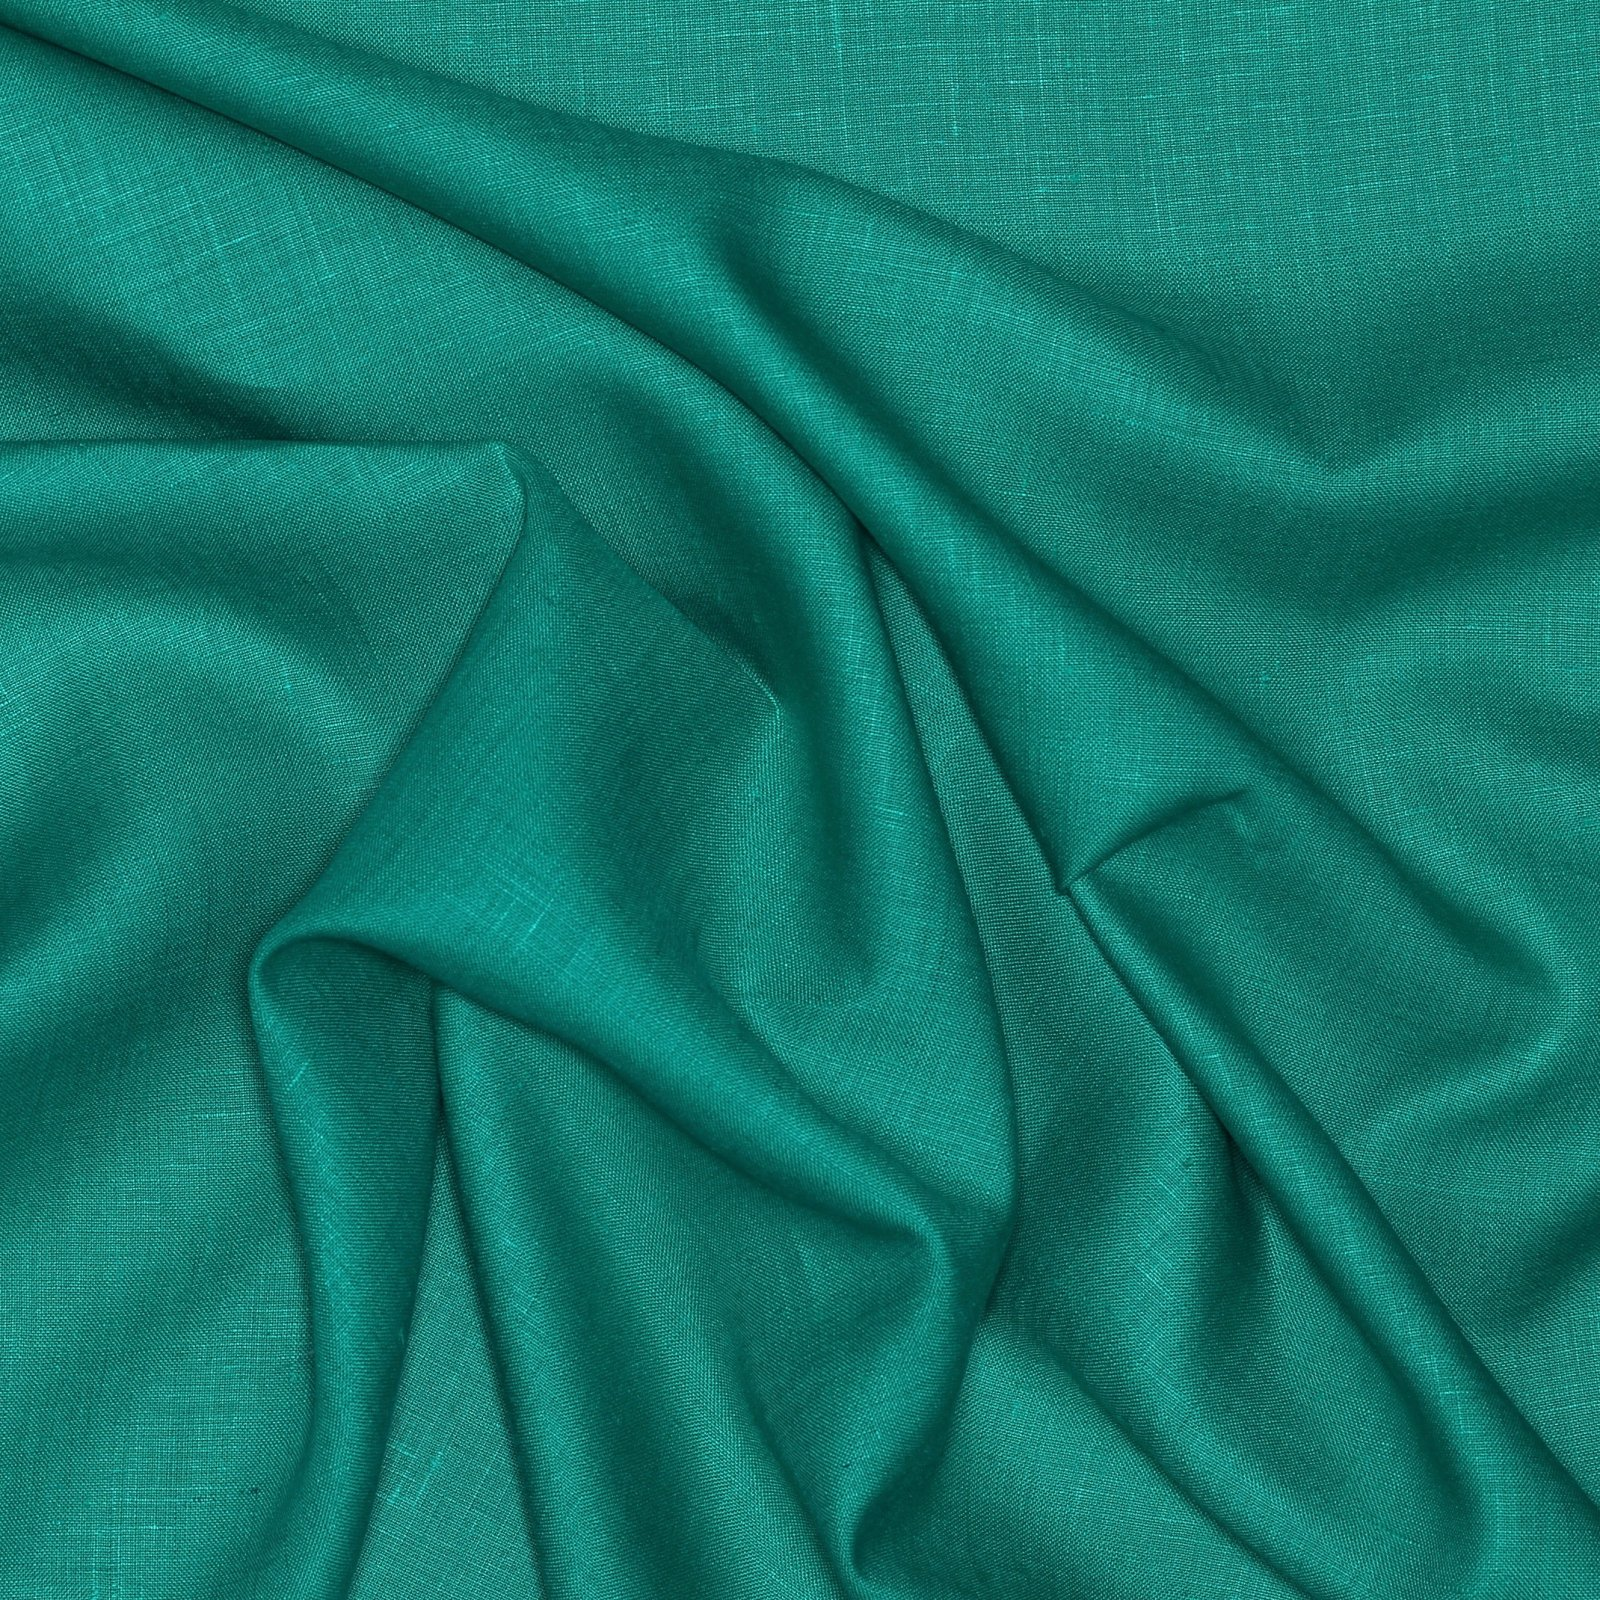 Green Sanforized Italian Linen